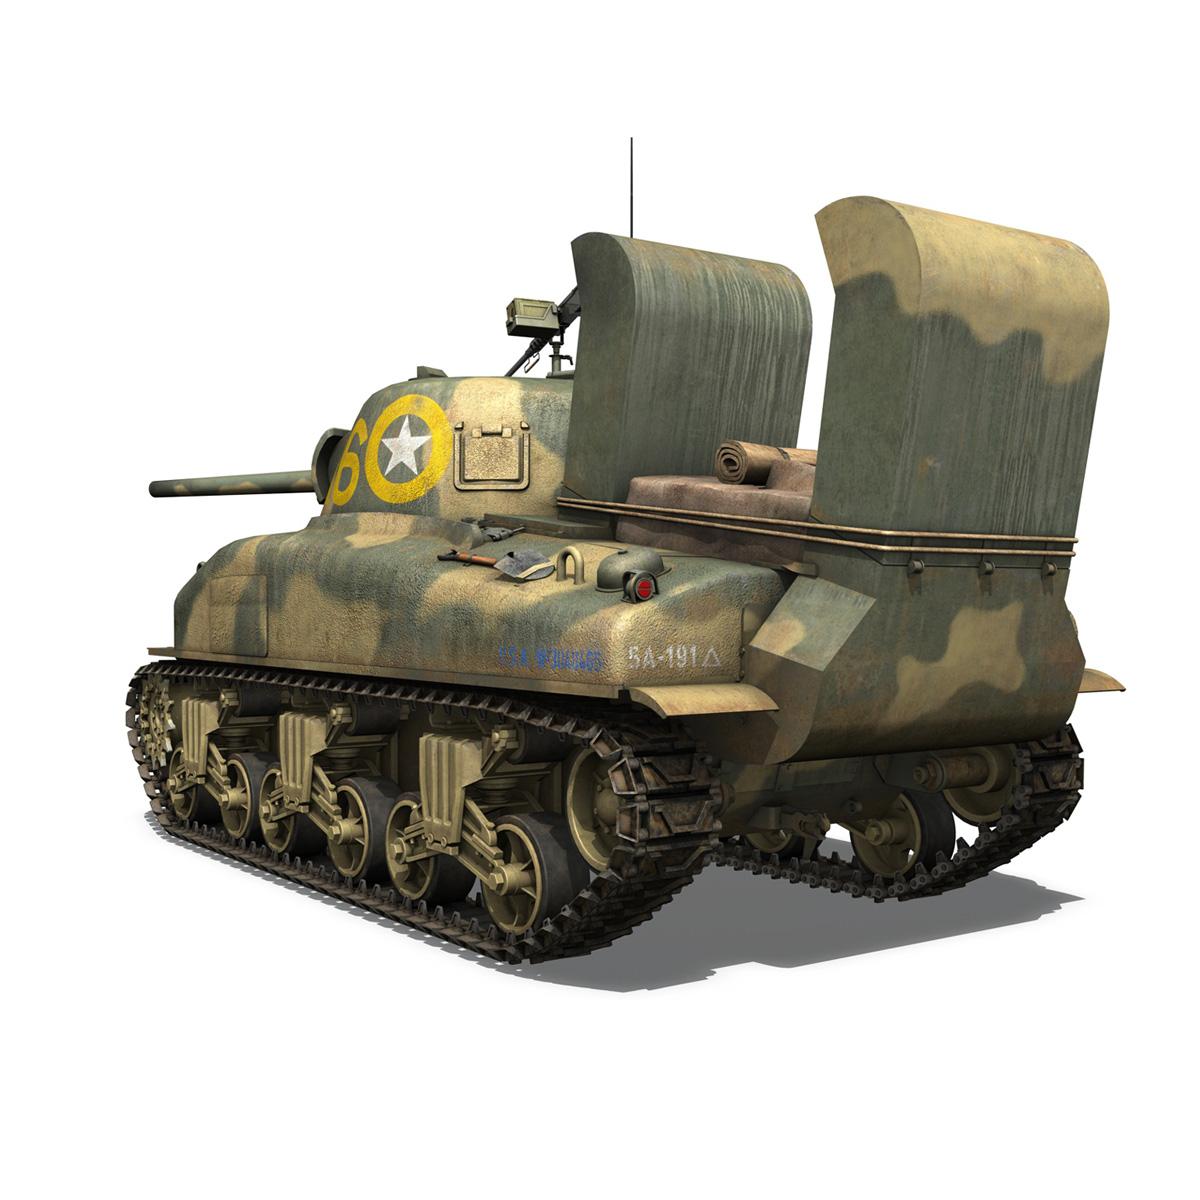 M4A1 Sherman - 16 3d model 3ds fbx c4d lwo lws lw obj 273054